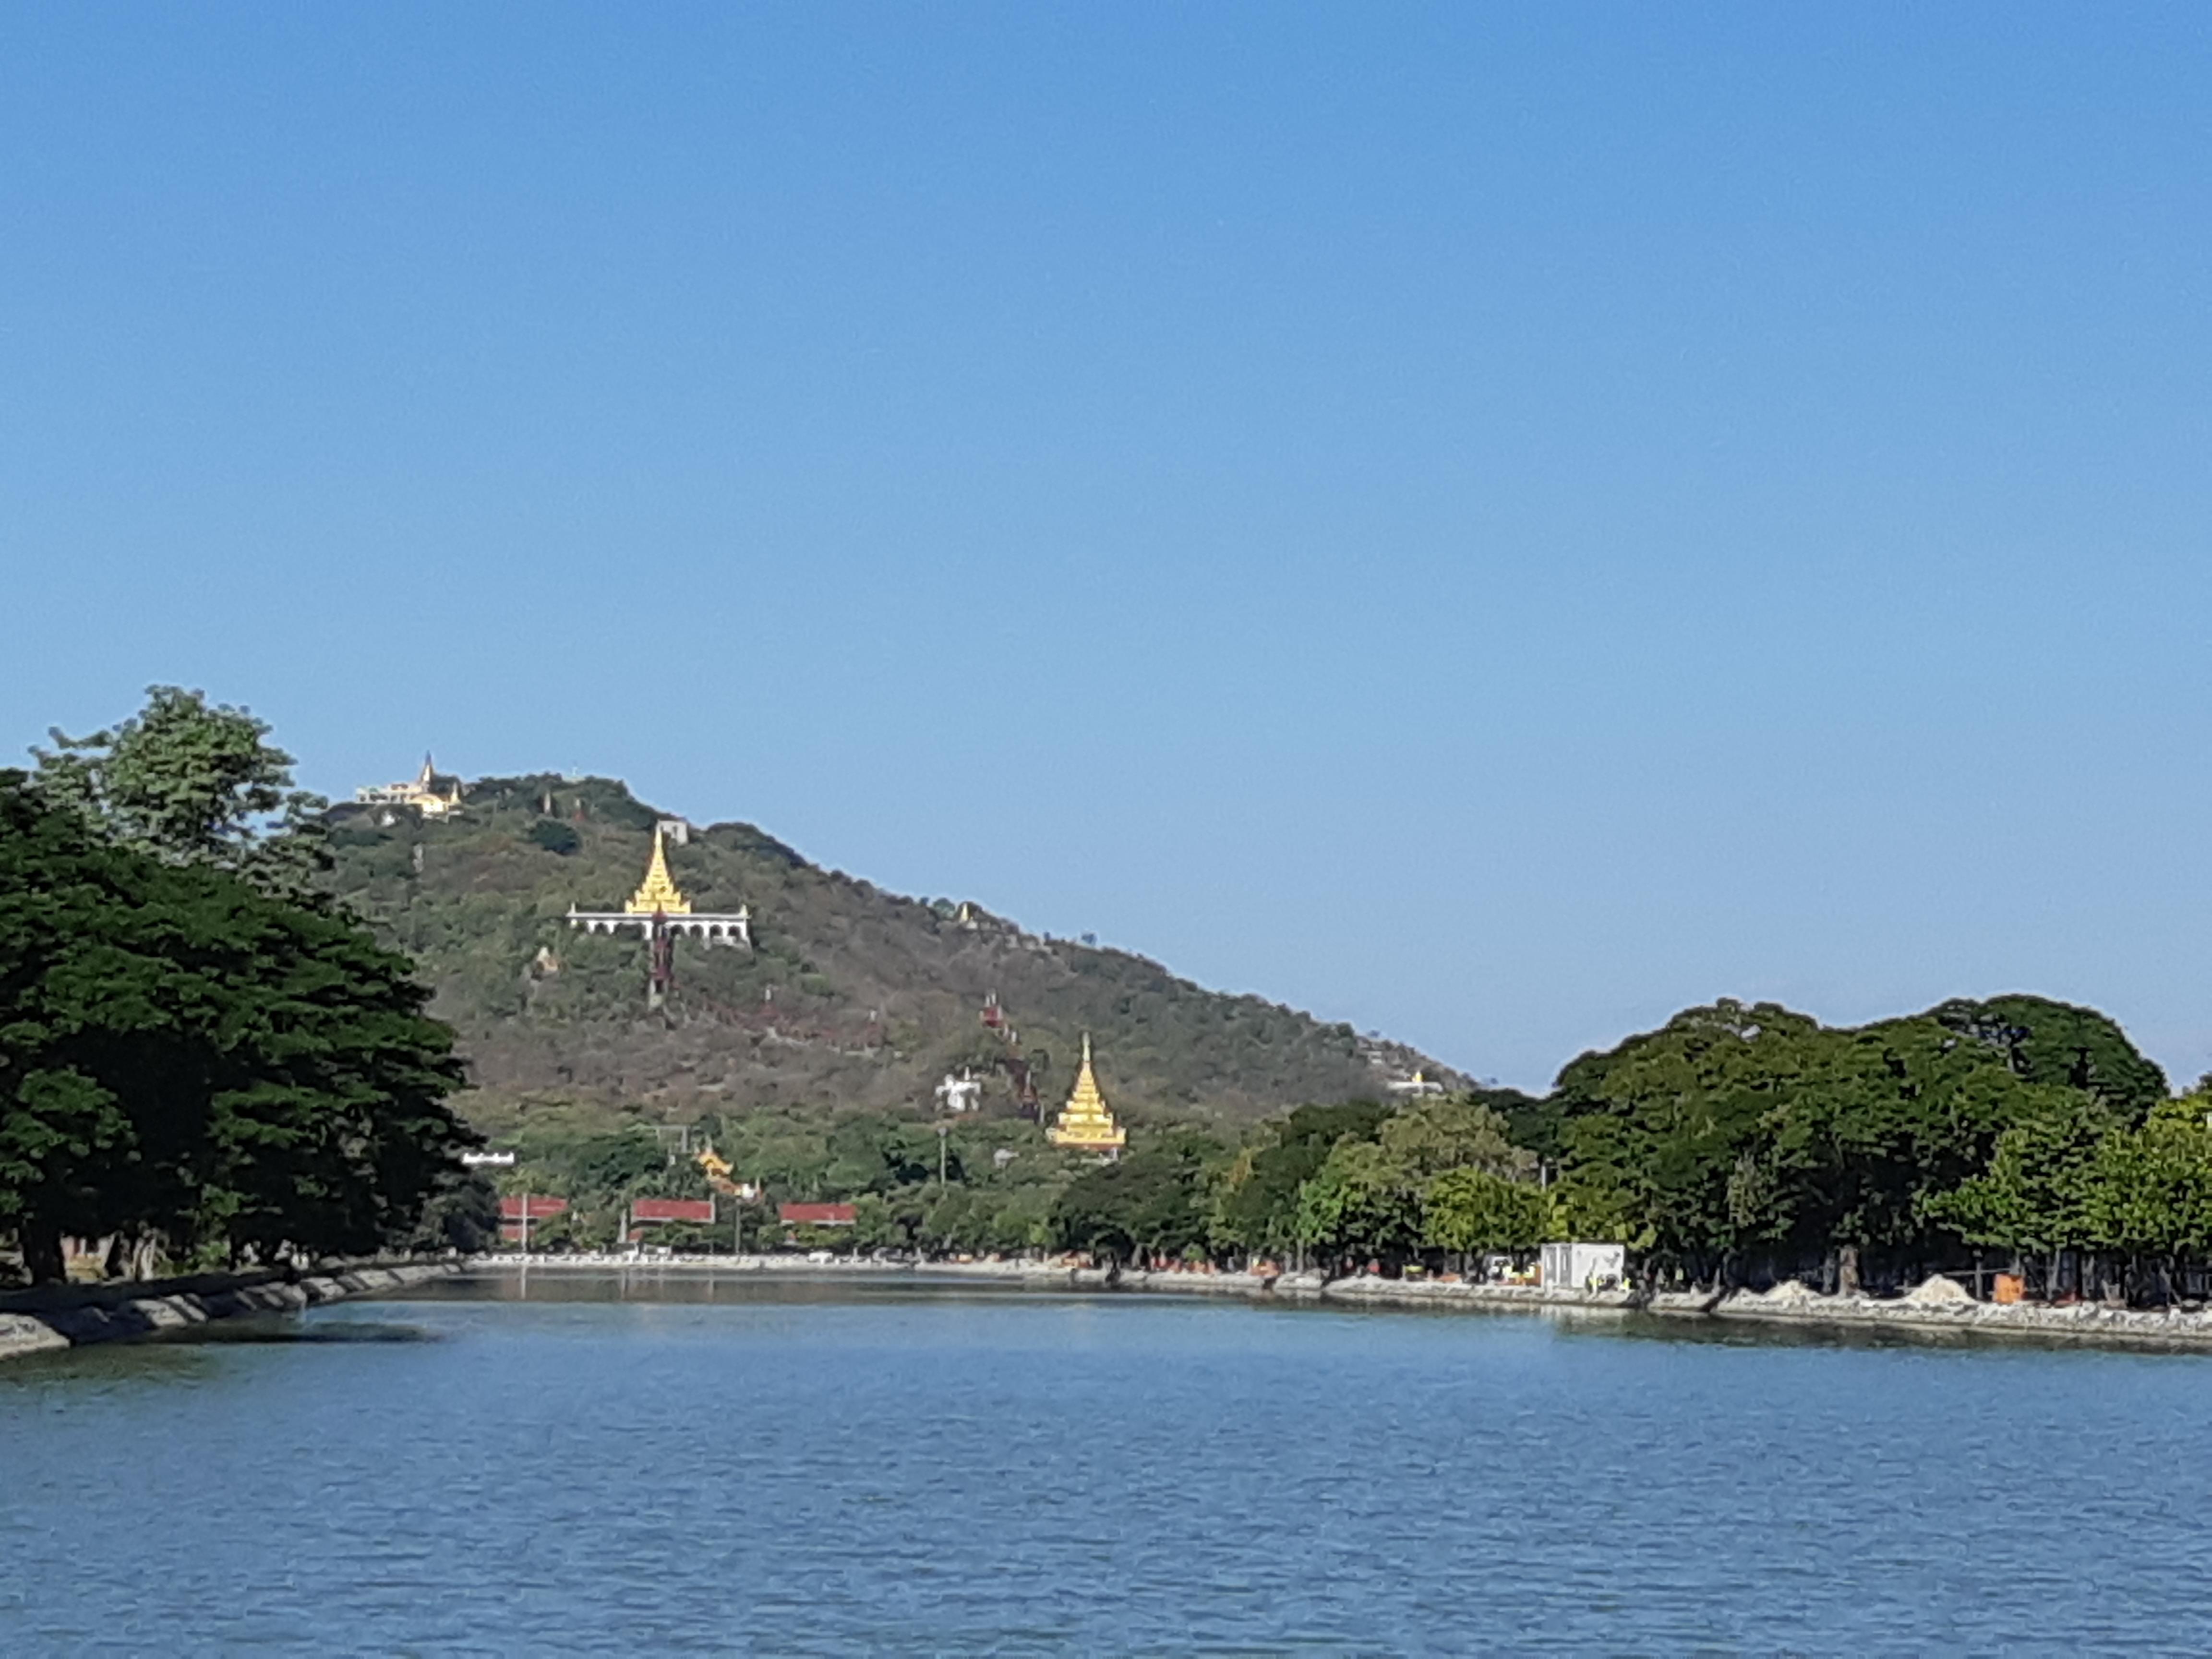 A photo of Mandalay Hill